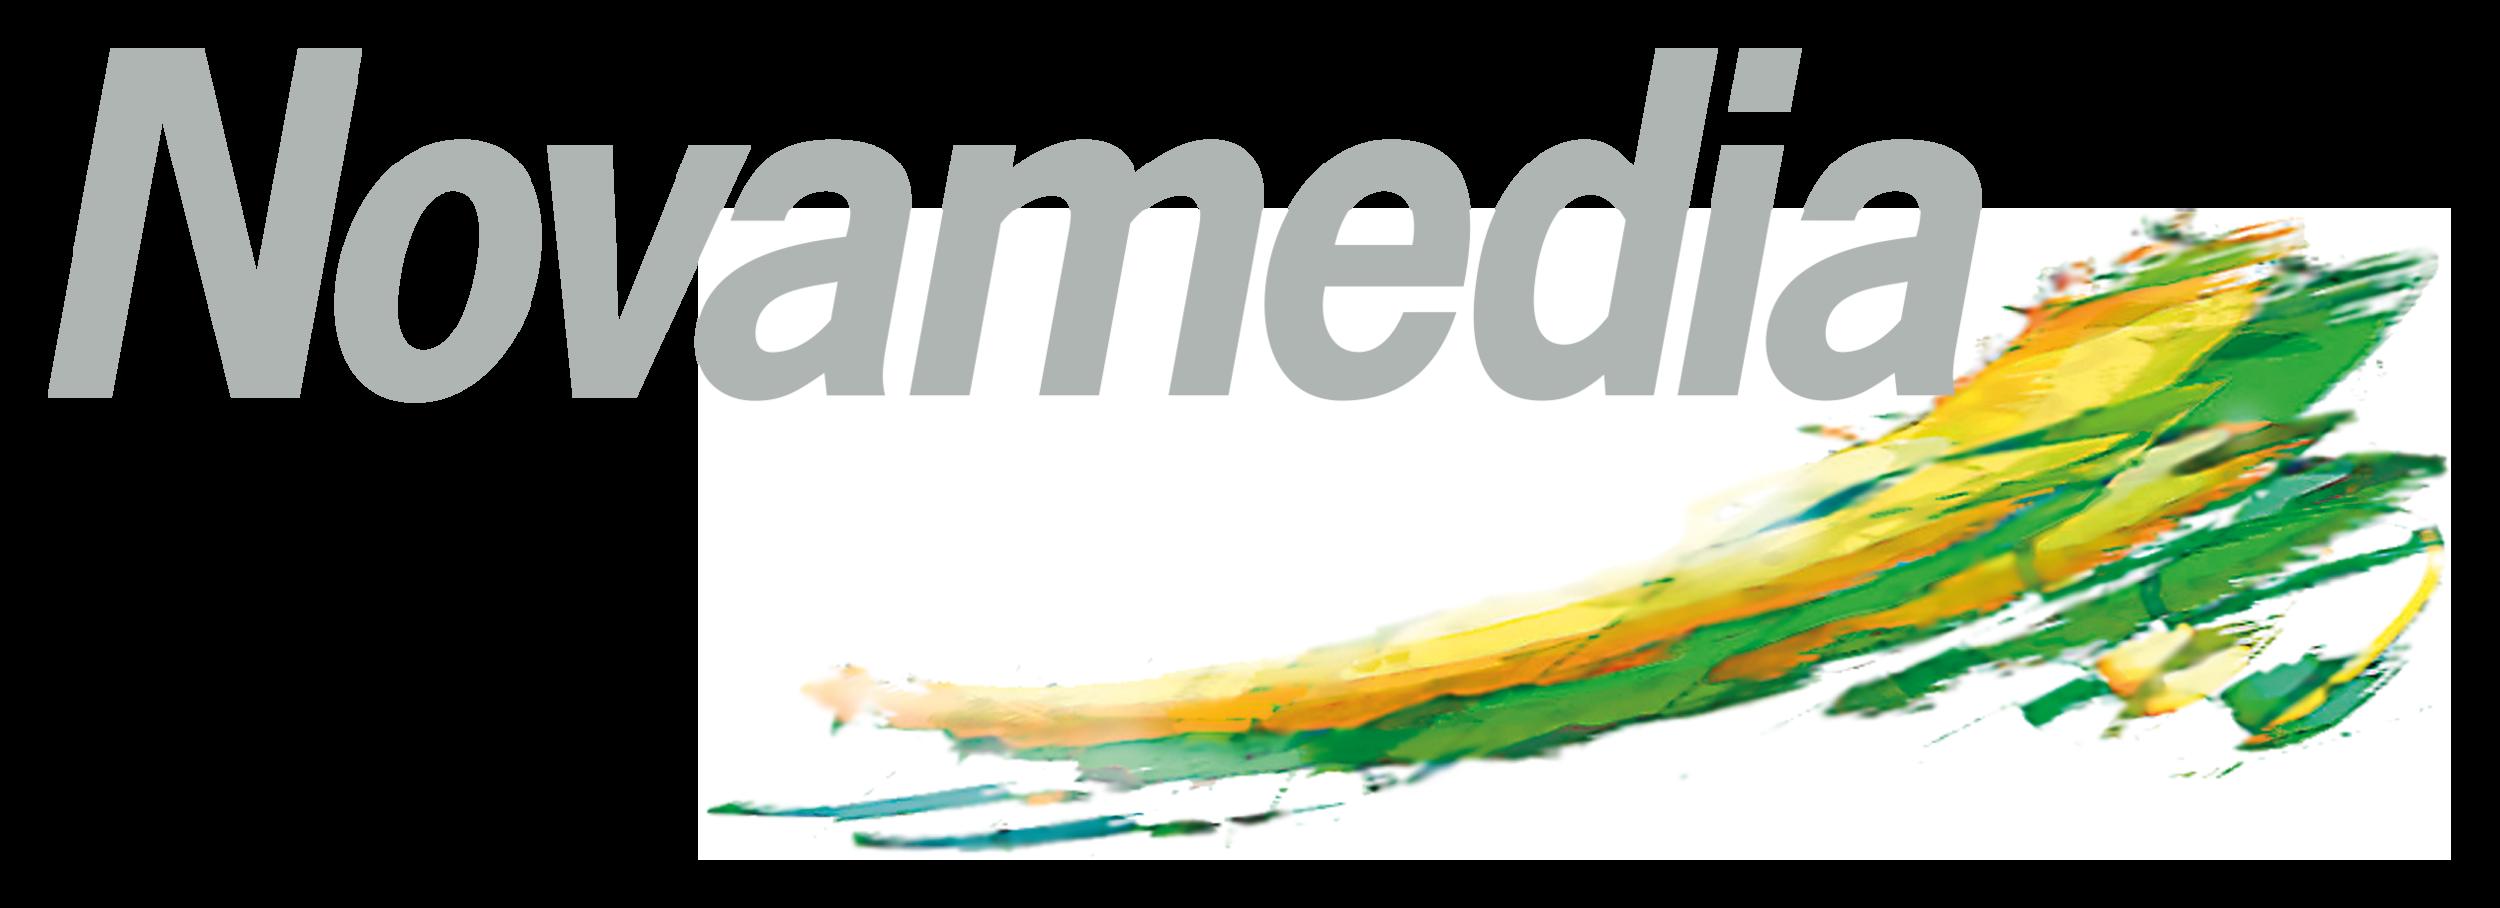 Novamedia logo Brush_02_RGB.png